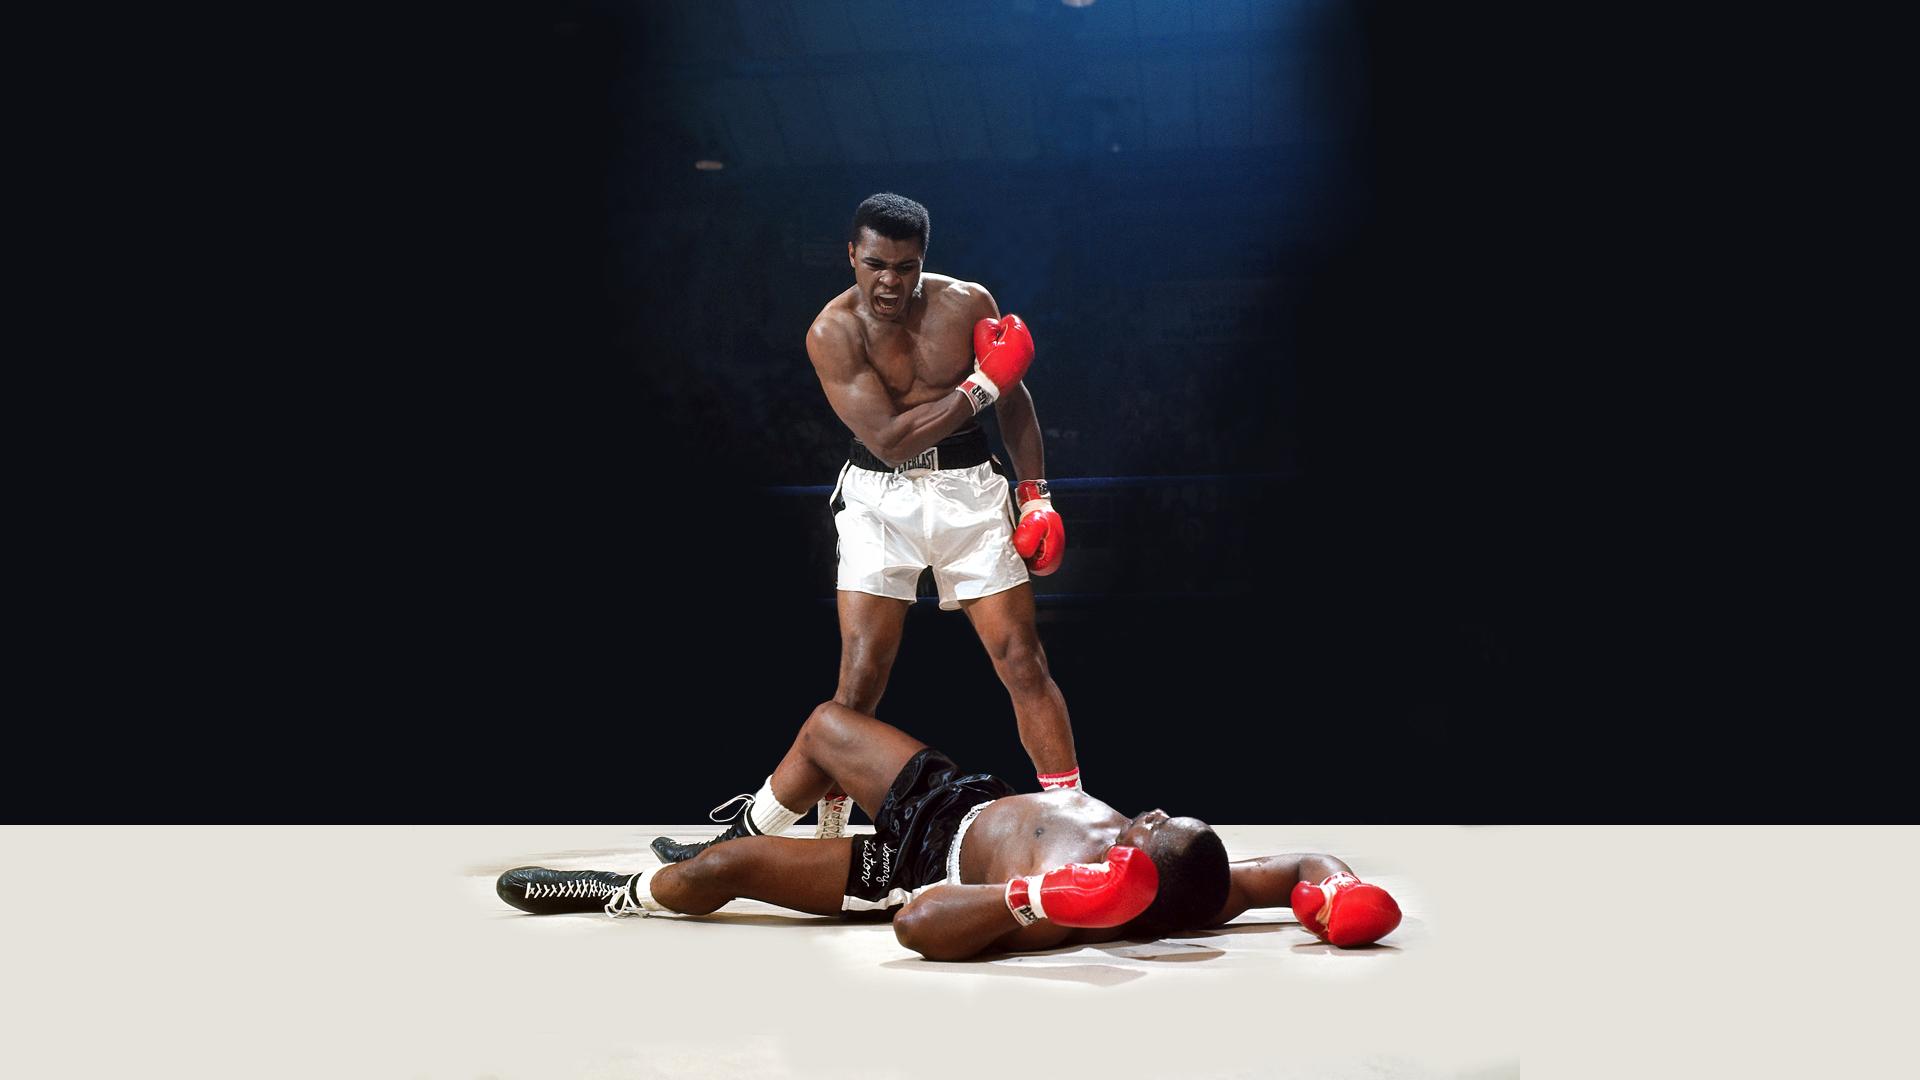 Muhammad Ali Wallpaper Hd Iphone Sports Boxe Fond D 233 Cran